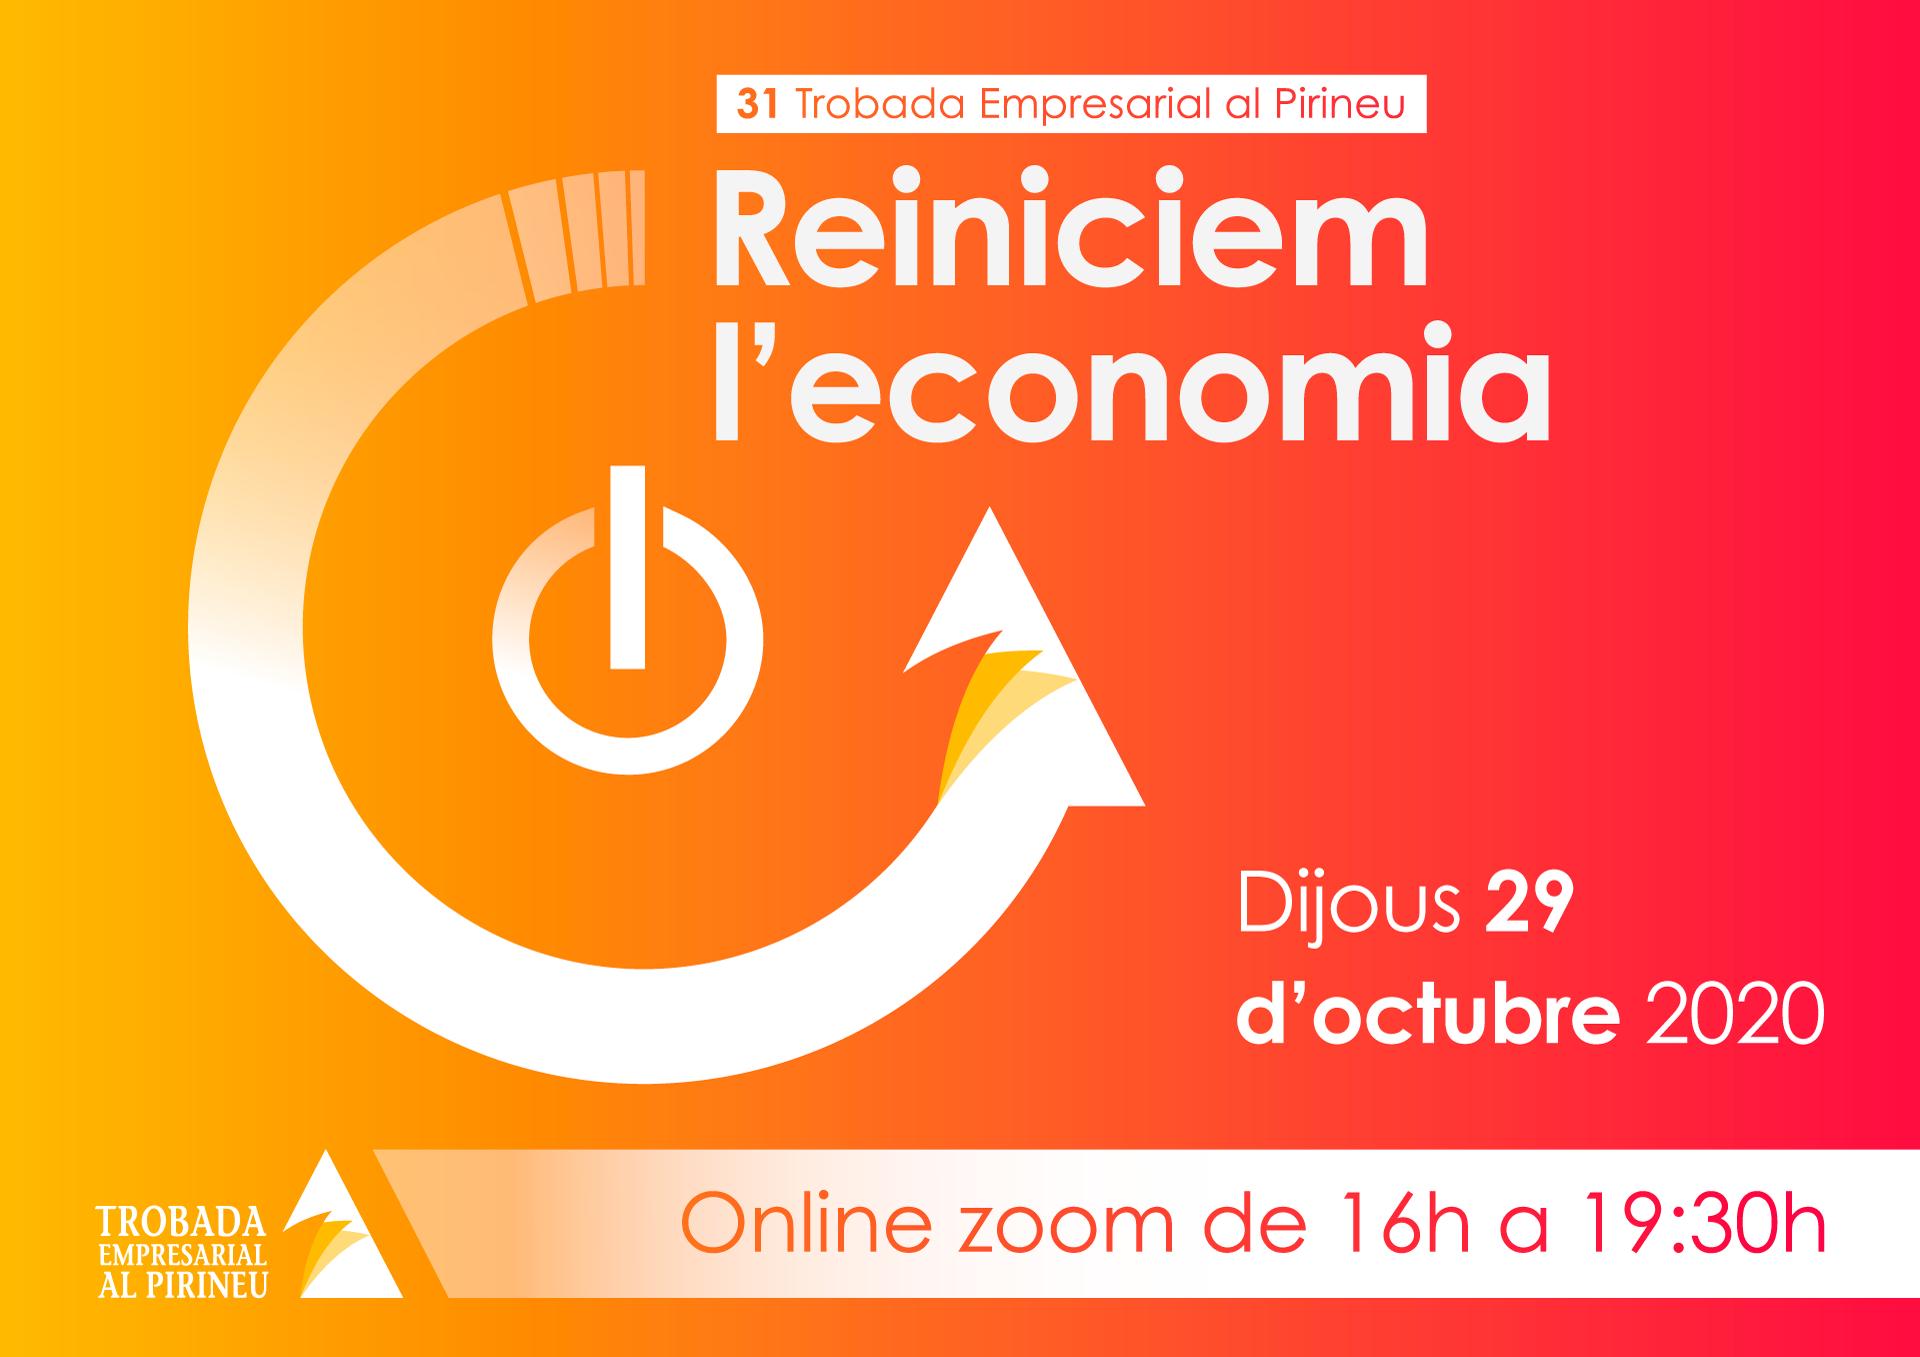 31-trobada-empresarial-pirineu-2020